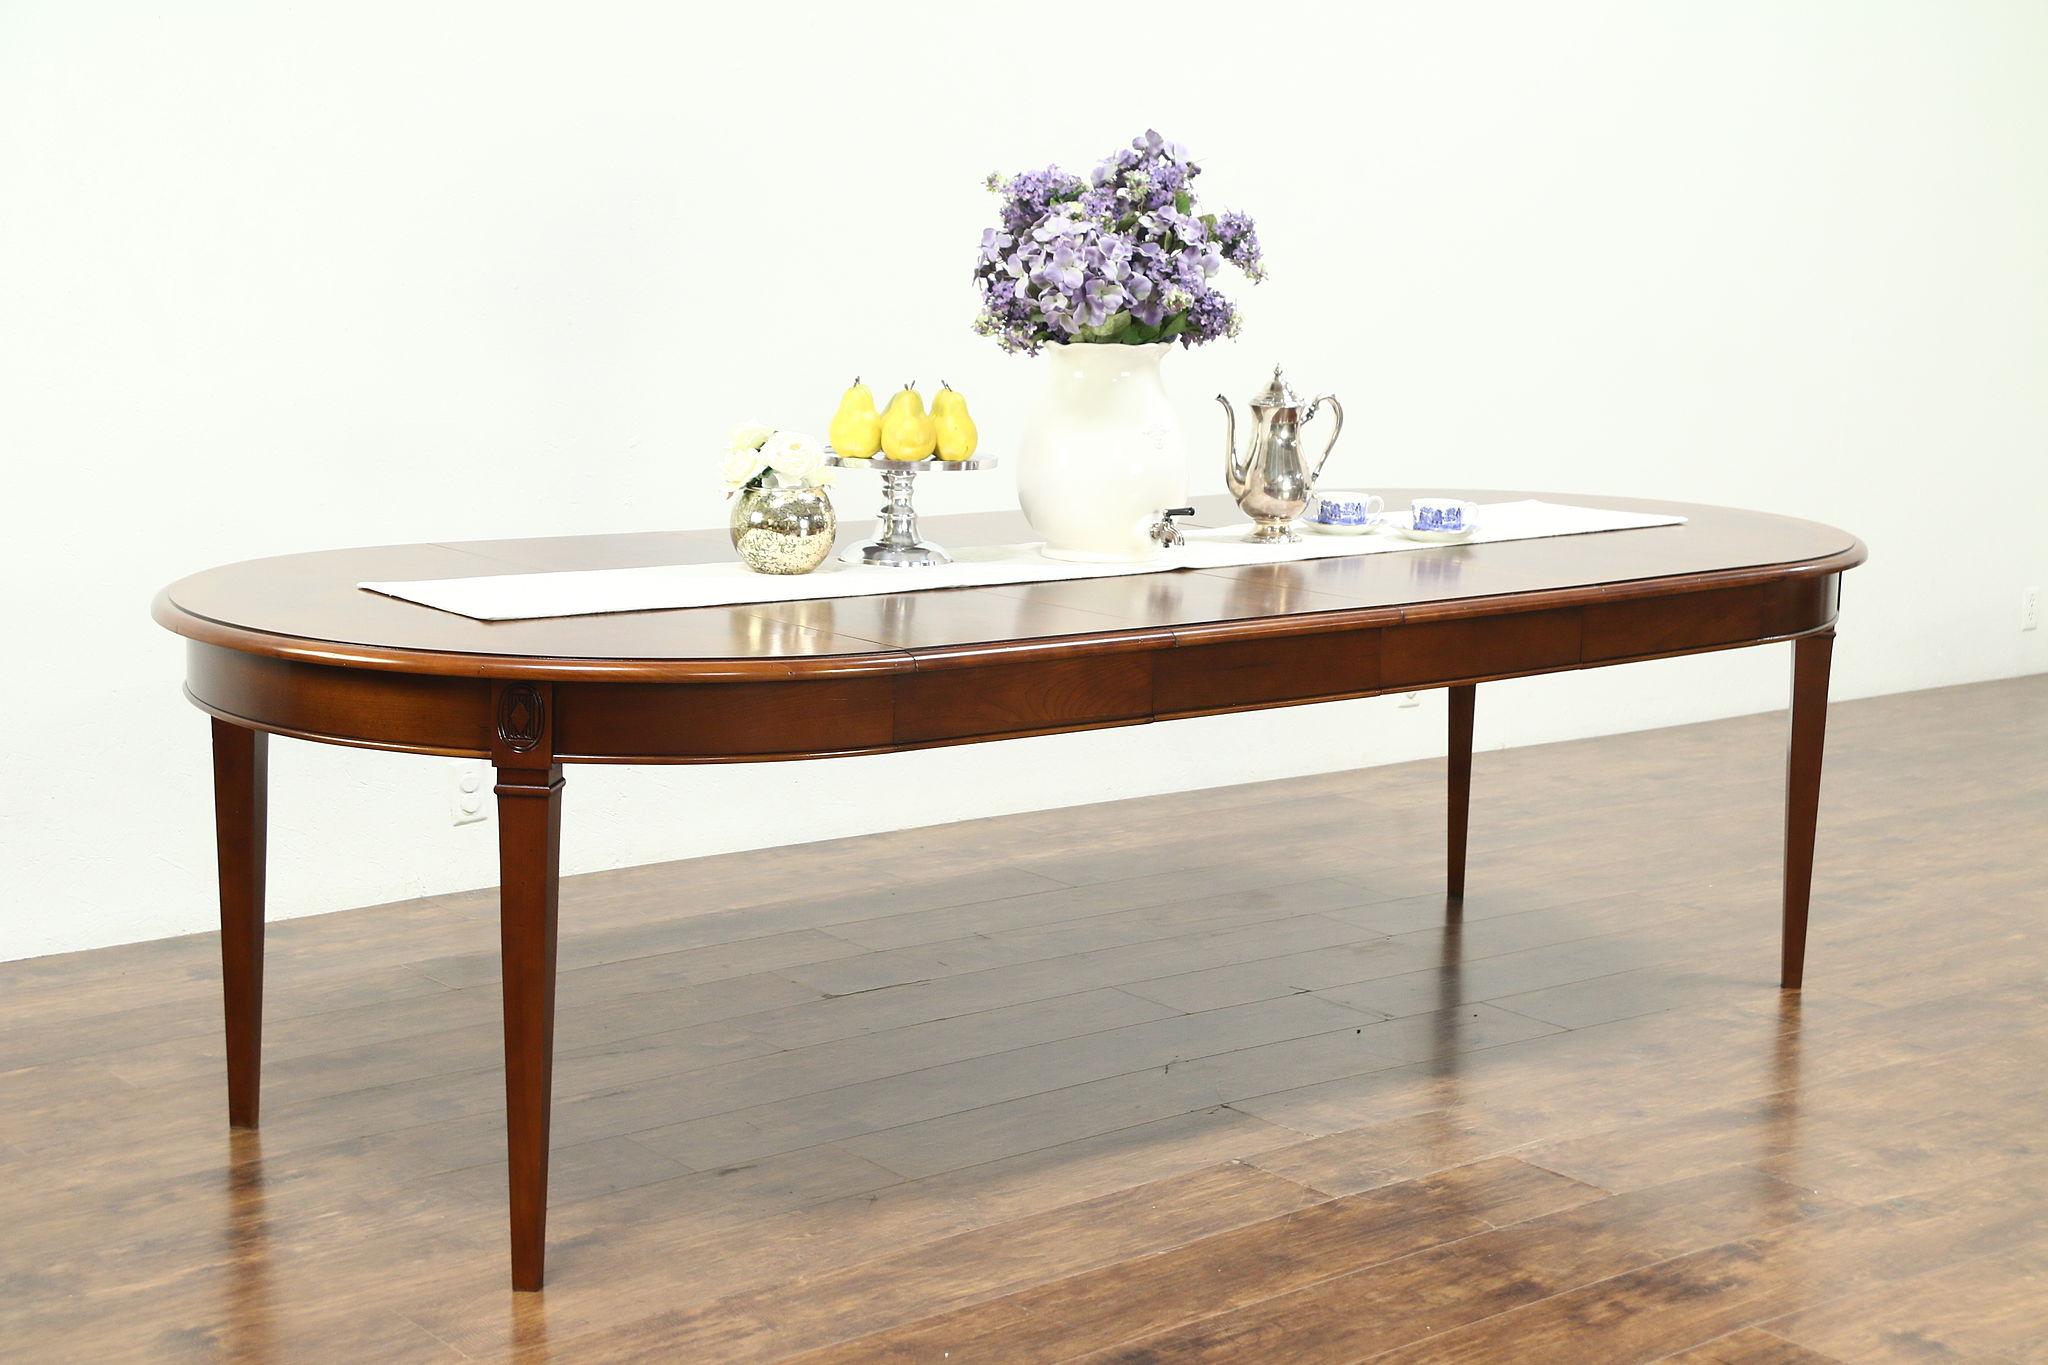 Round Vintage Cherry Sunburst Dining Table 4 Leaves 102 Long Harden 28839